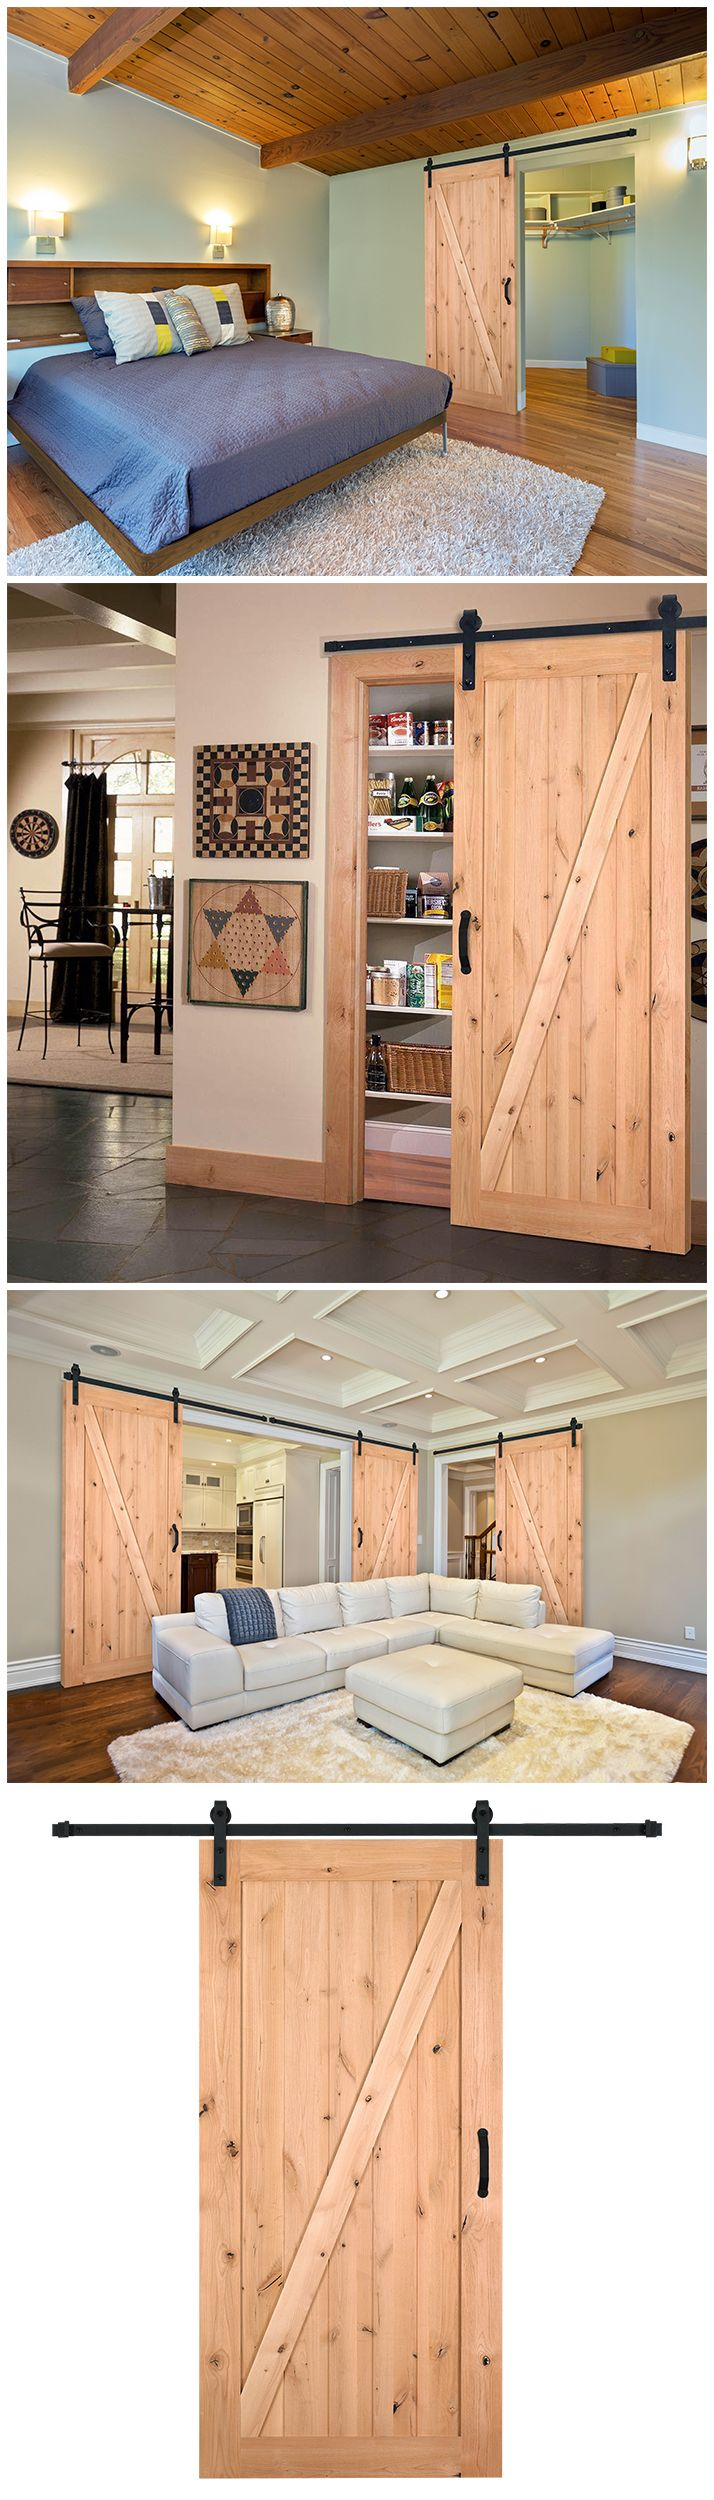 referencia estilo porta estúdio